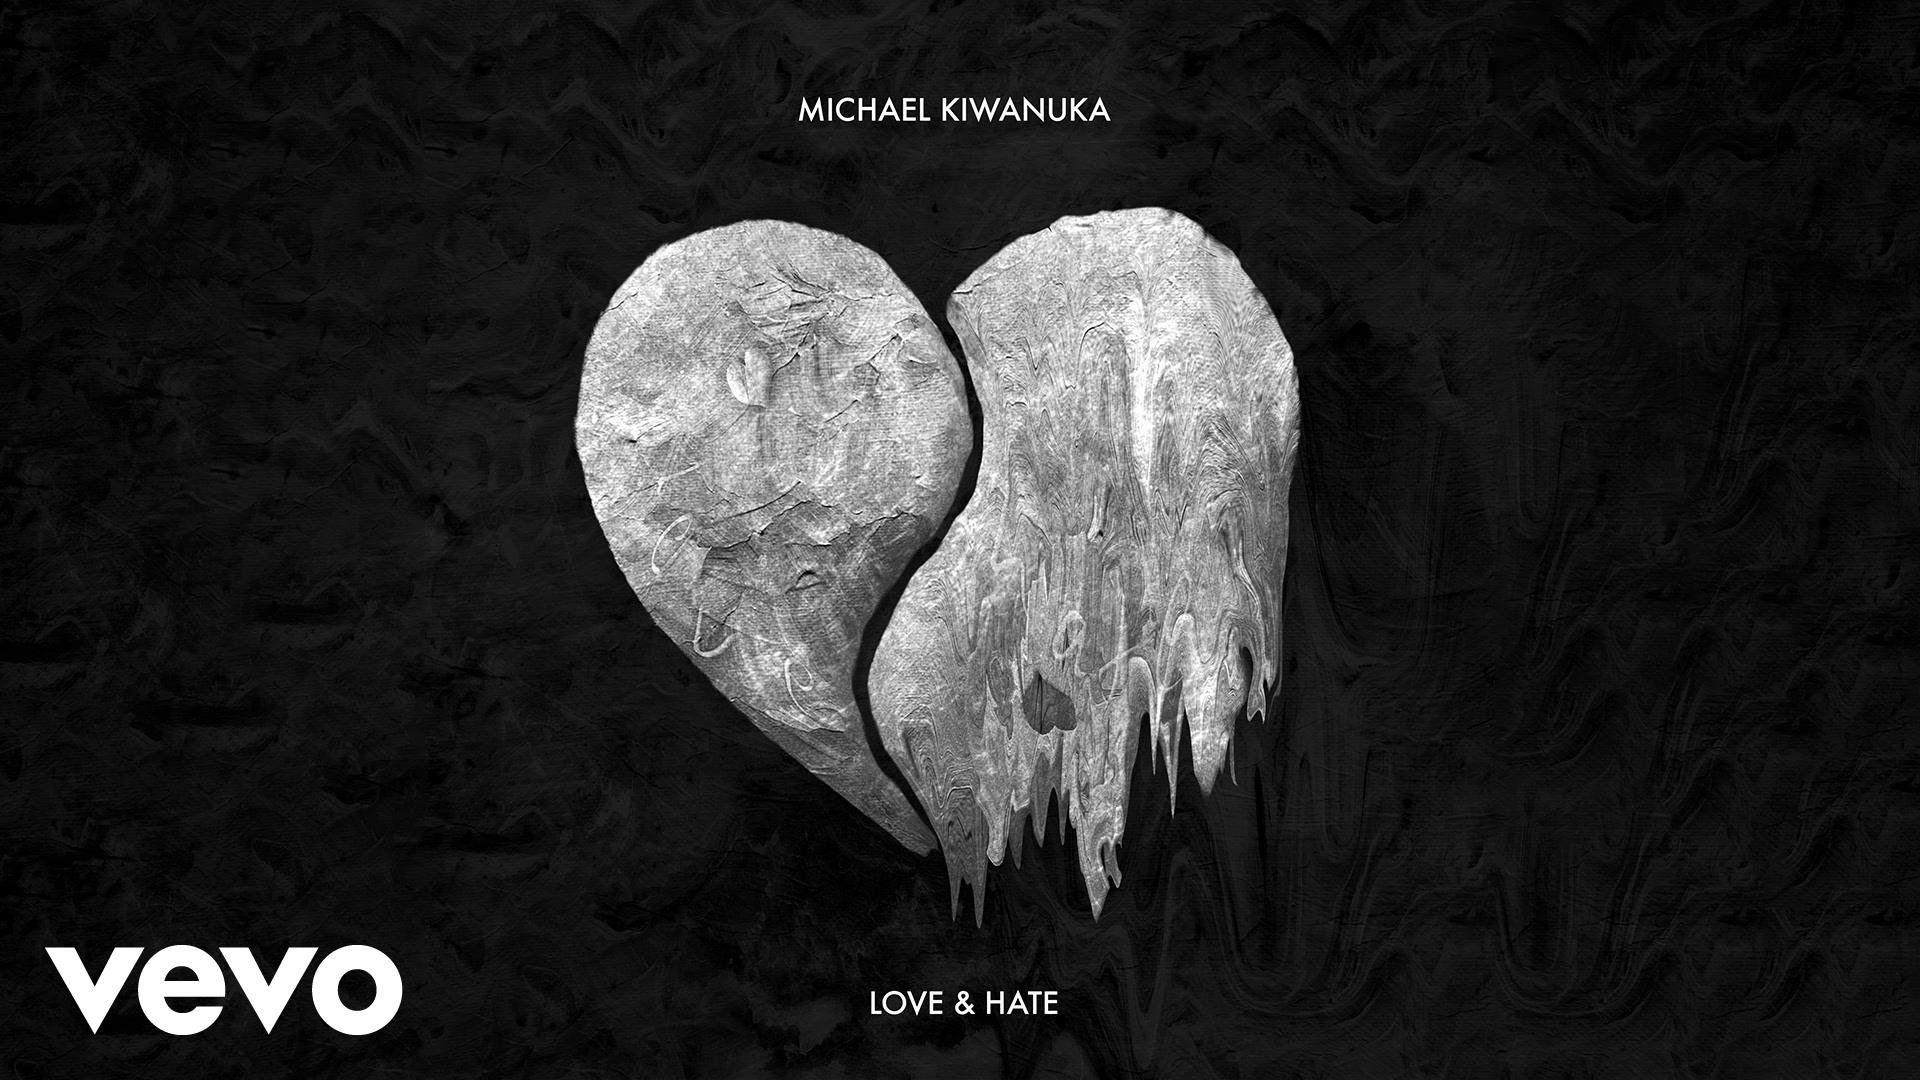 Michael Kiwanuka One More Night Audio Music Album Art One More Night Soundtrack To My Life